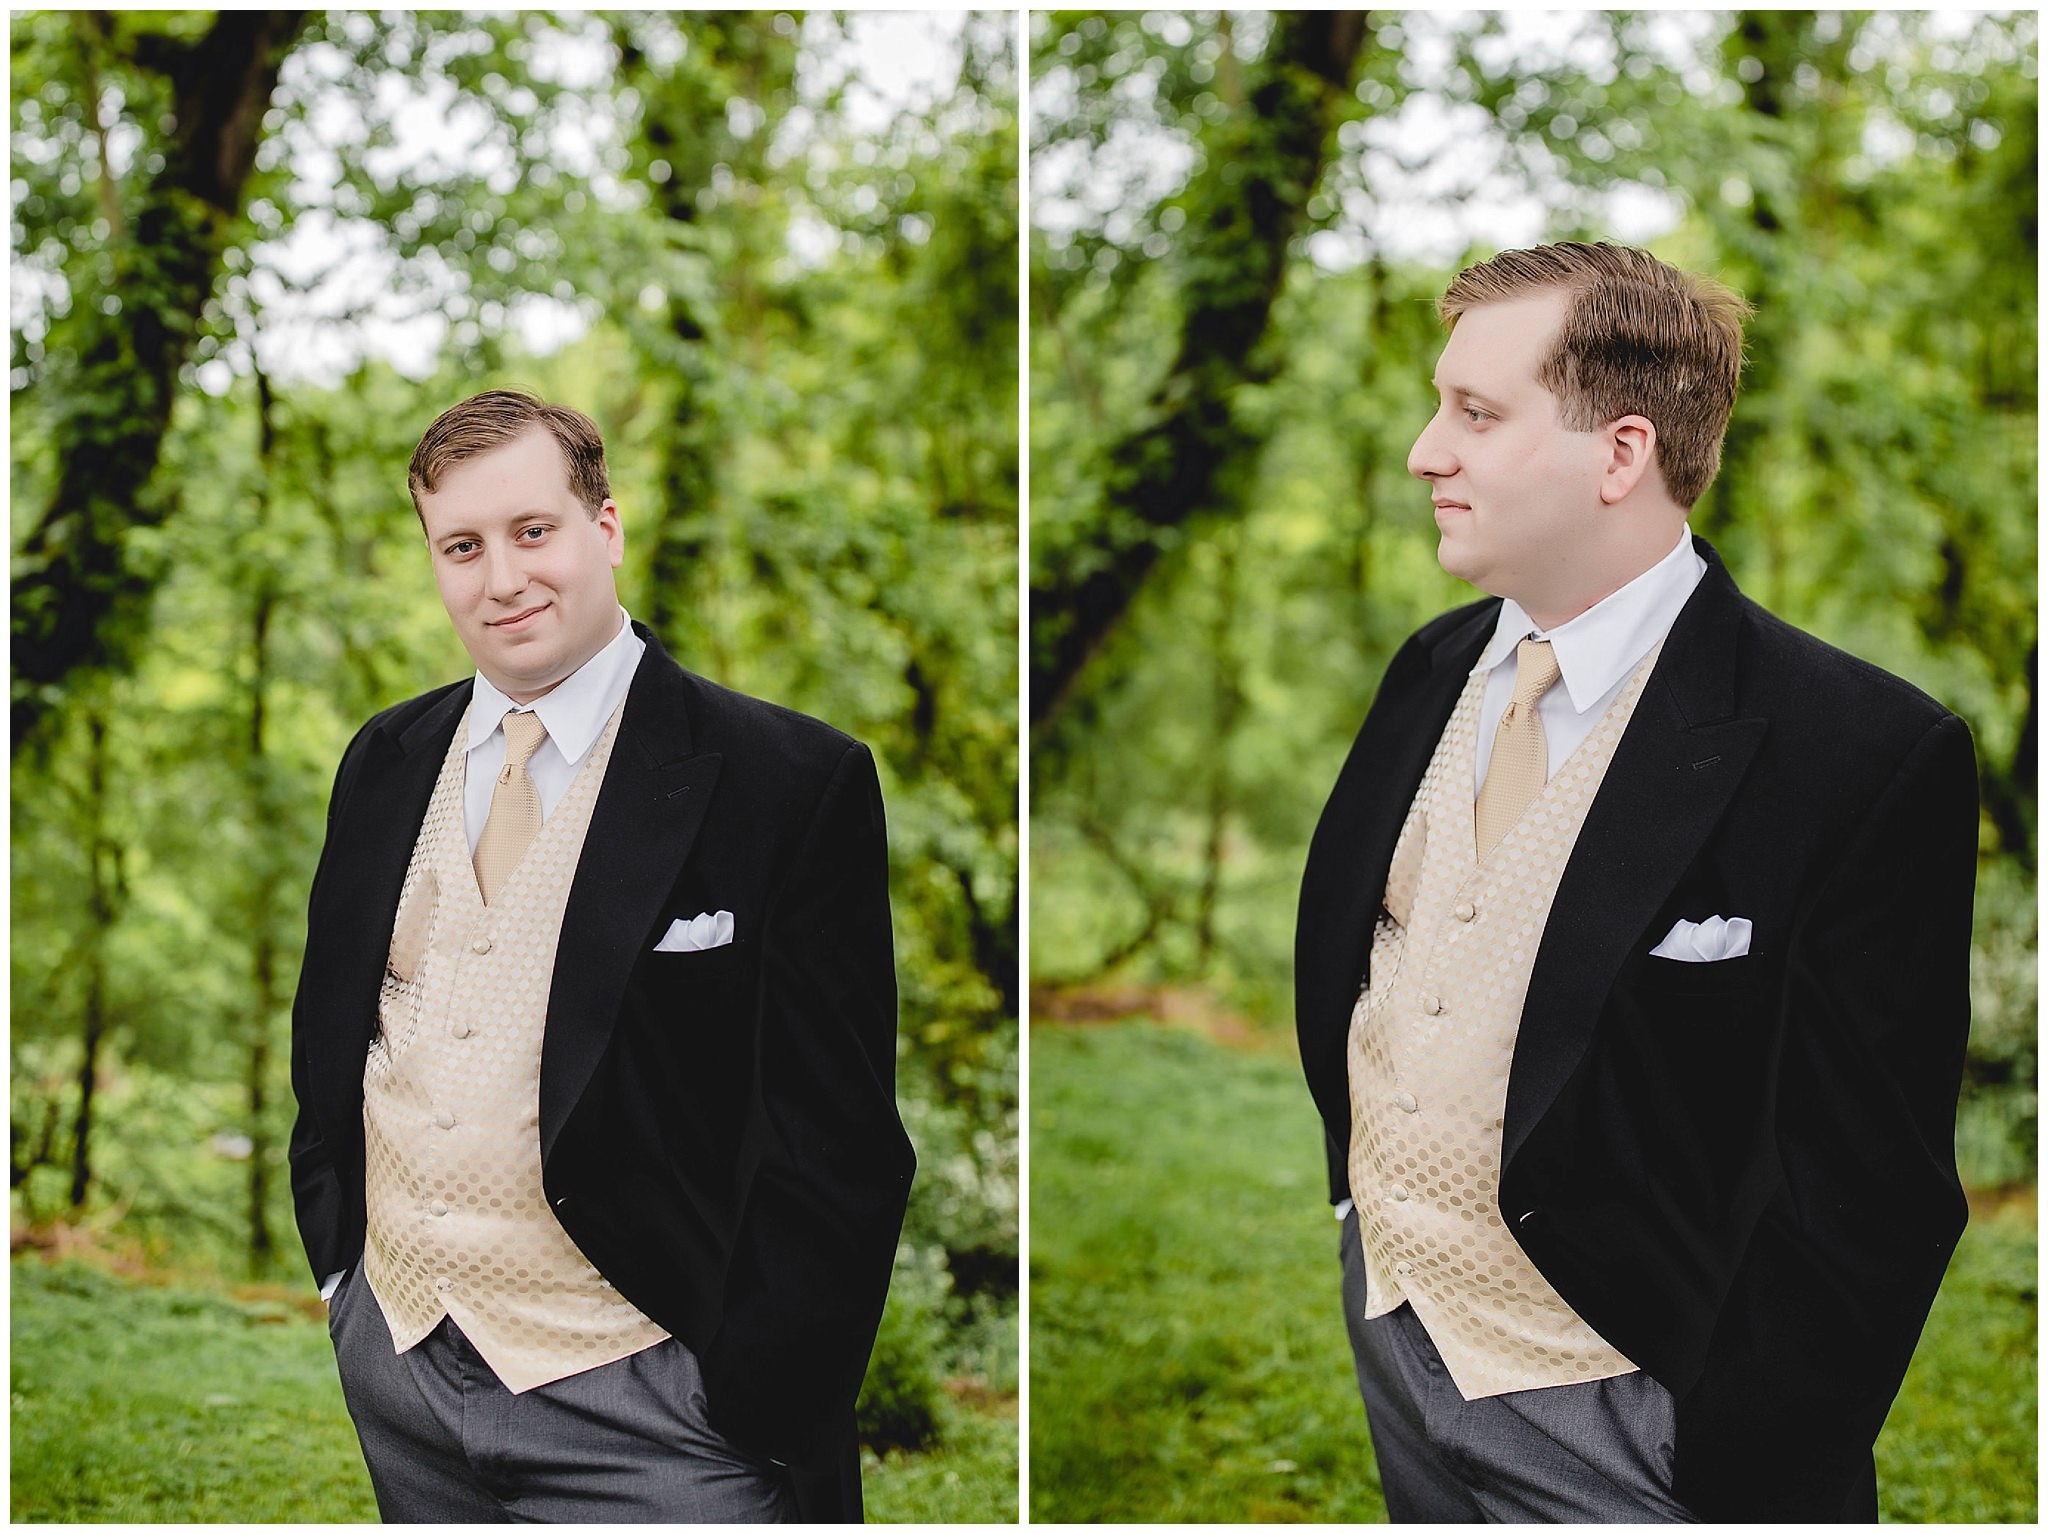 Groom portrait in tuxedo with yellow vest and tie